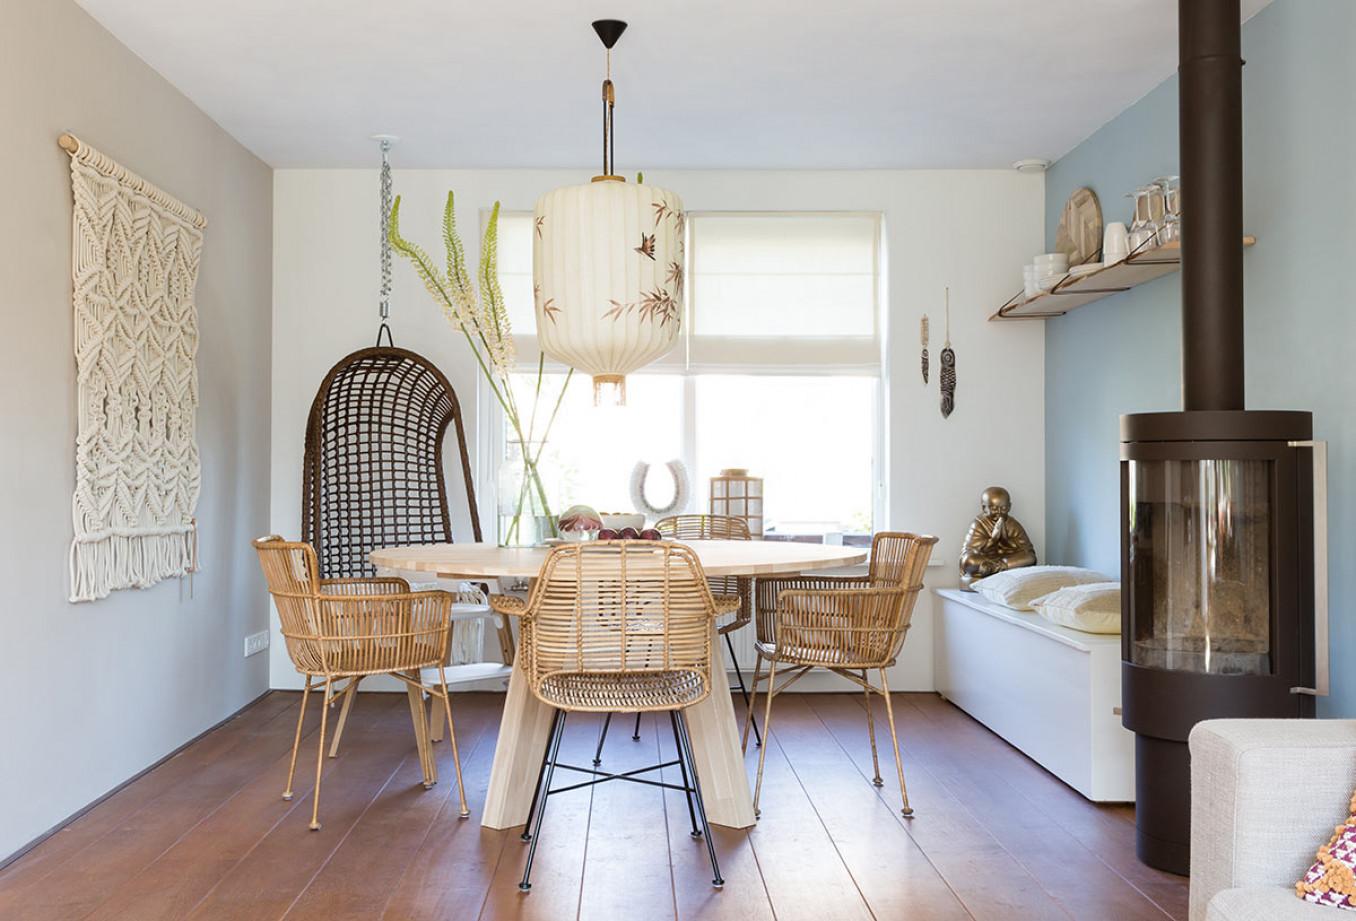 eethoek-blauw-rotan-hangstoel-houten-eettafel-rond-wandkleed-haard.jpg